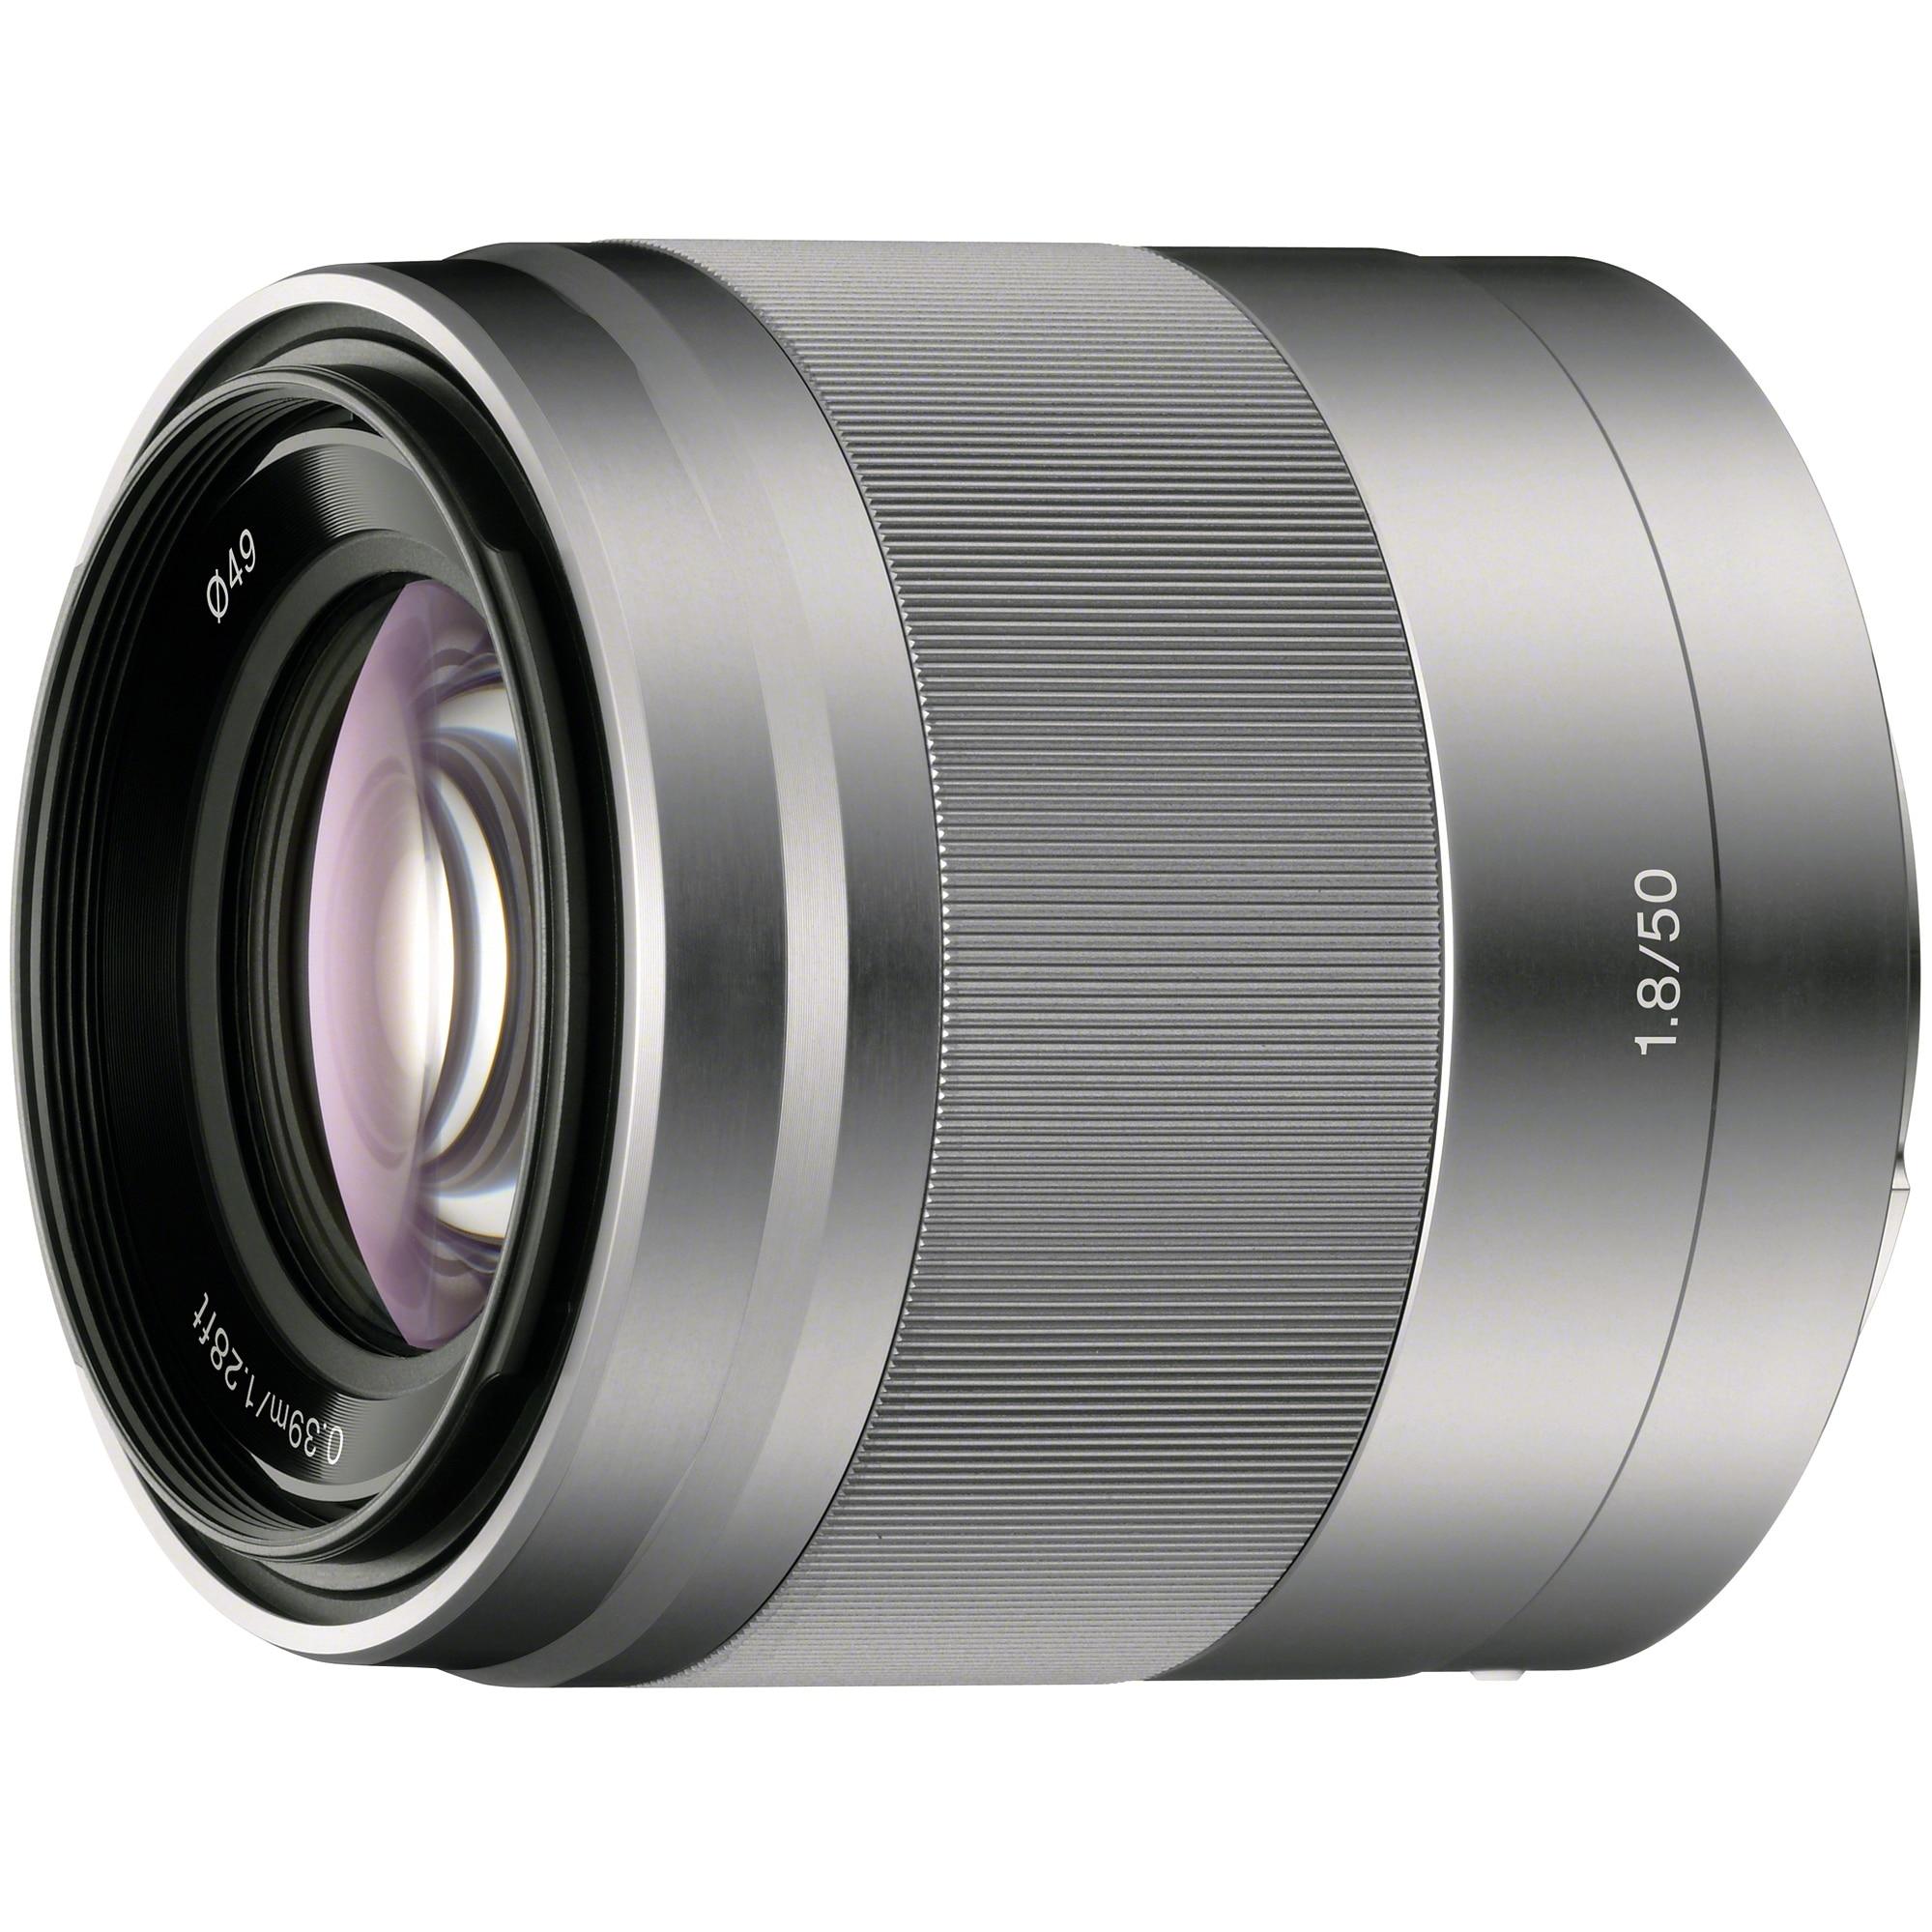 Fotografie Obiectiv Sony 50mm f1.8 OSS, Silver